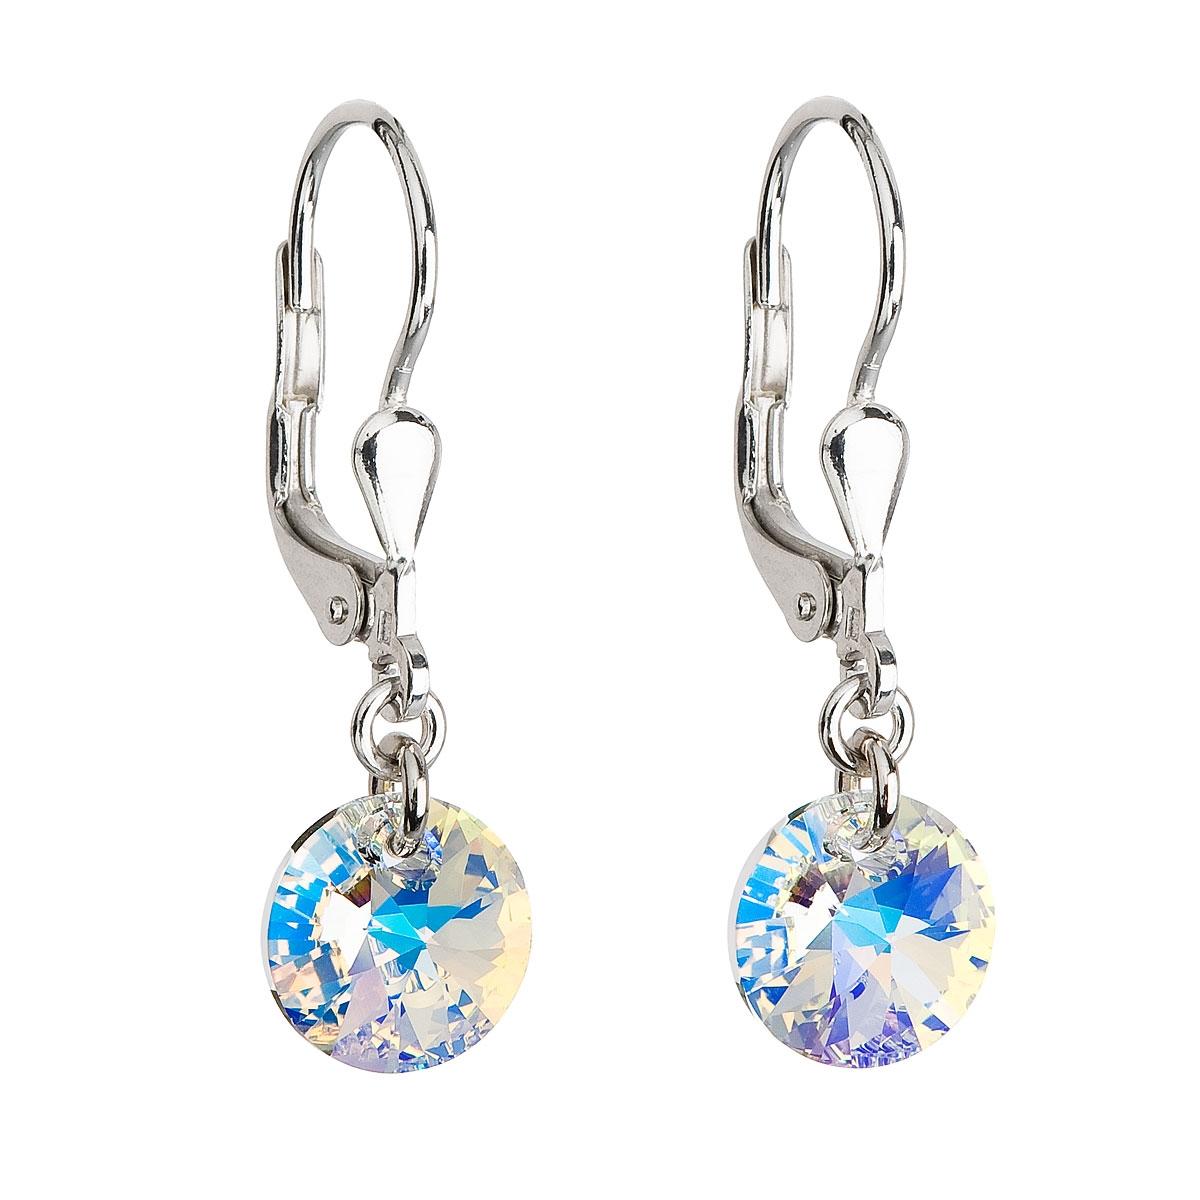 Stříbrné náušnice s krystaly Crystals from Swarovski®, AB